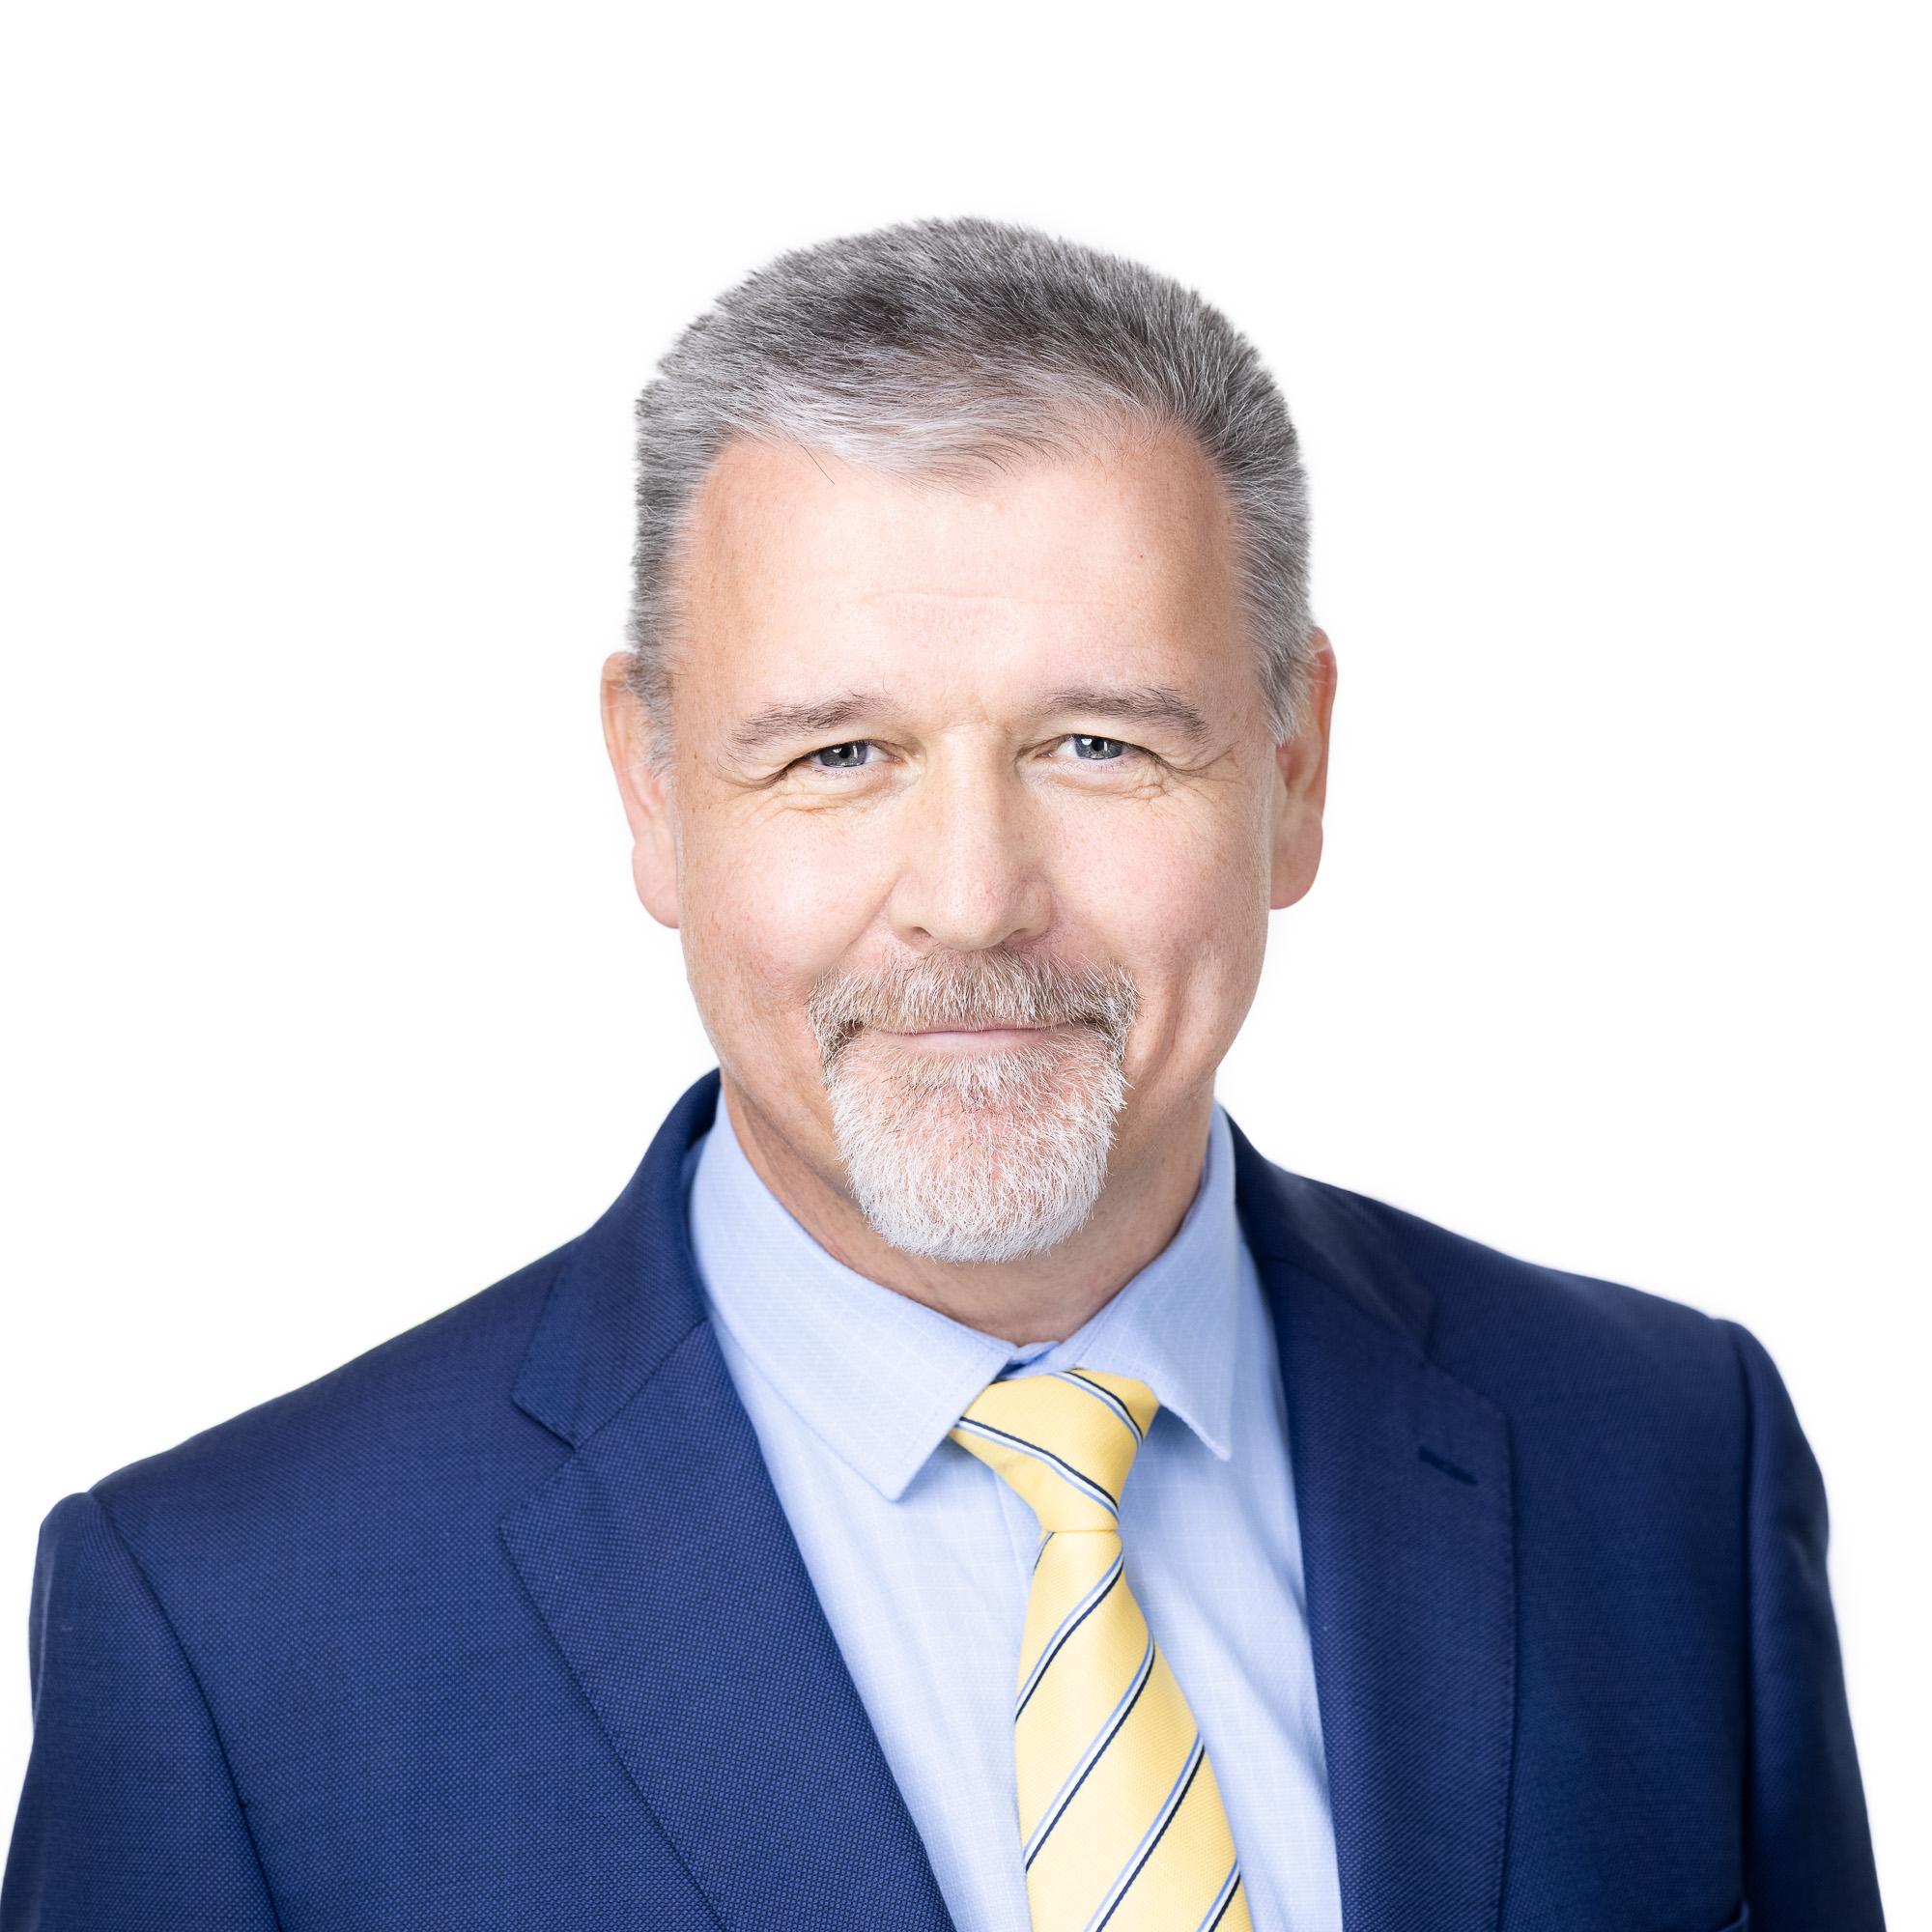 Martin Glennon